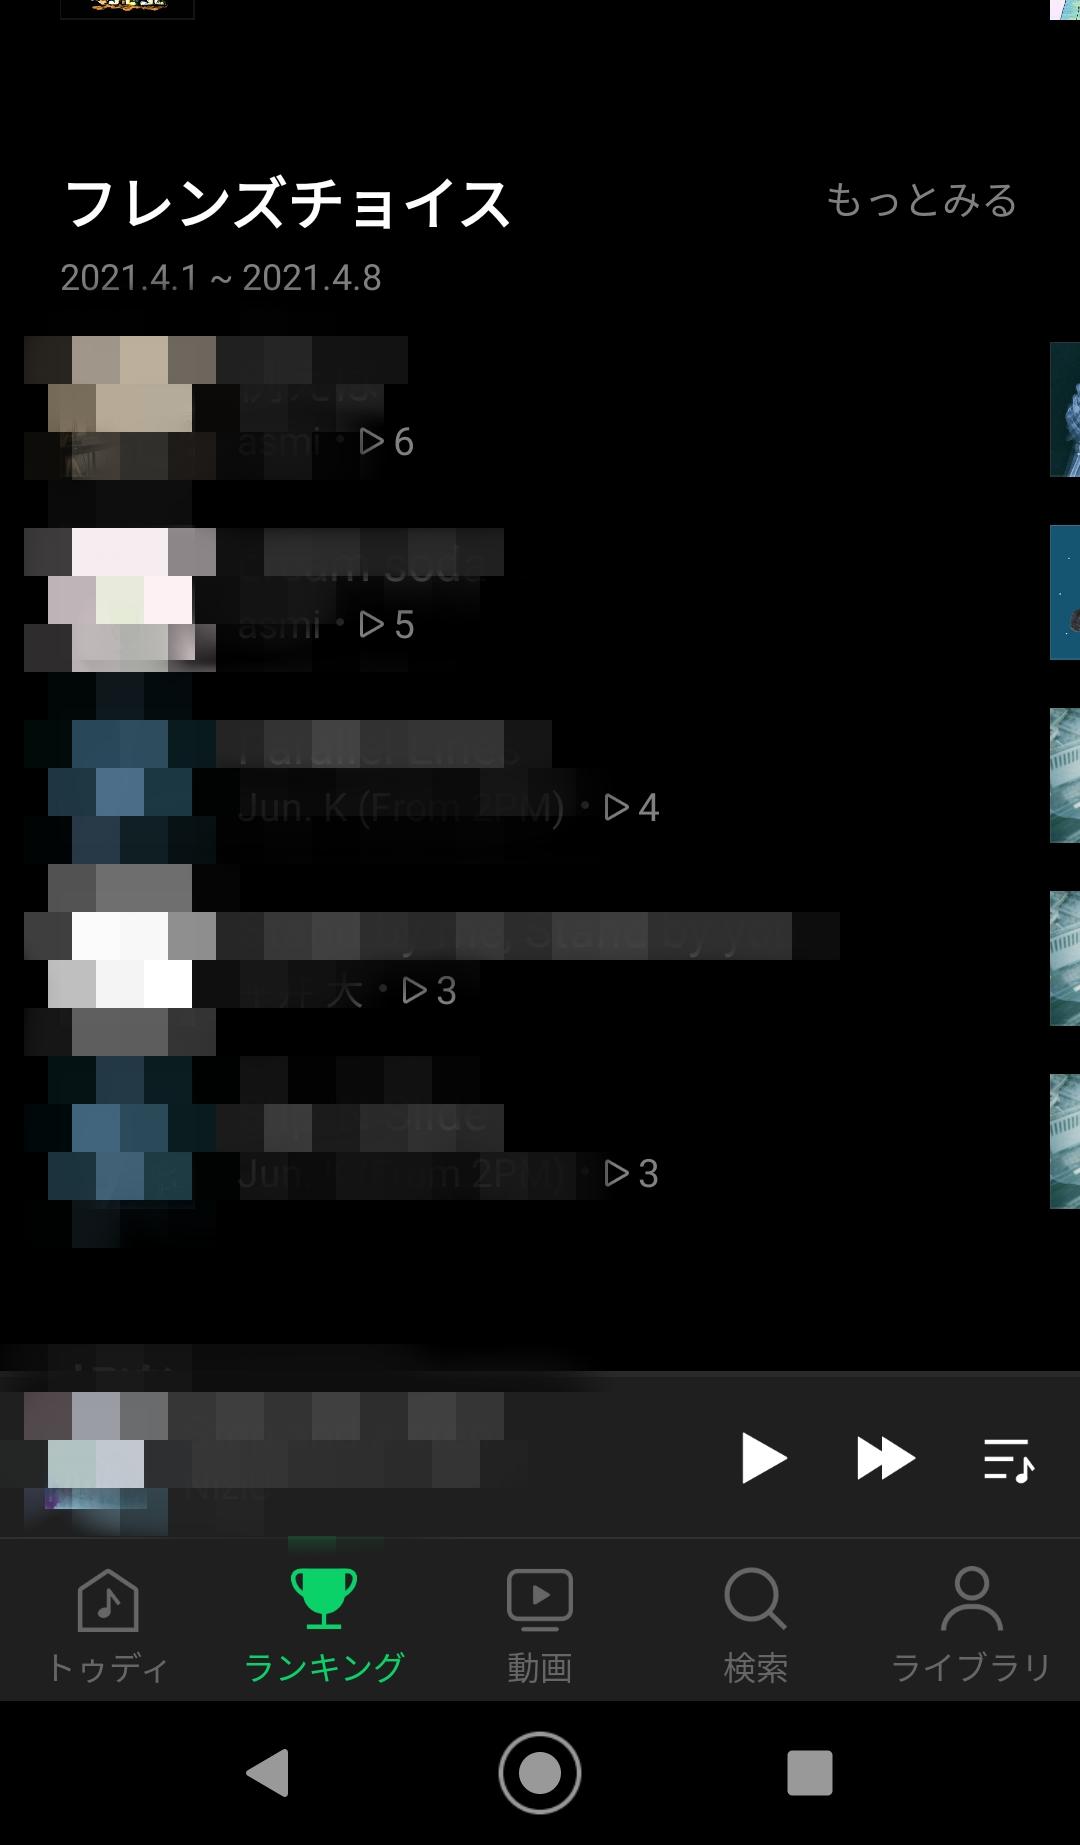 LINE MUSIC フレンズチョイス 表示 例 画面